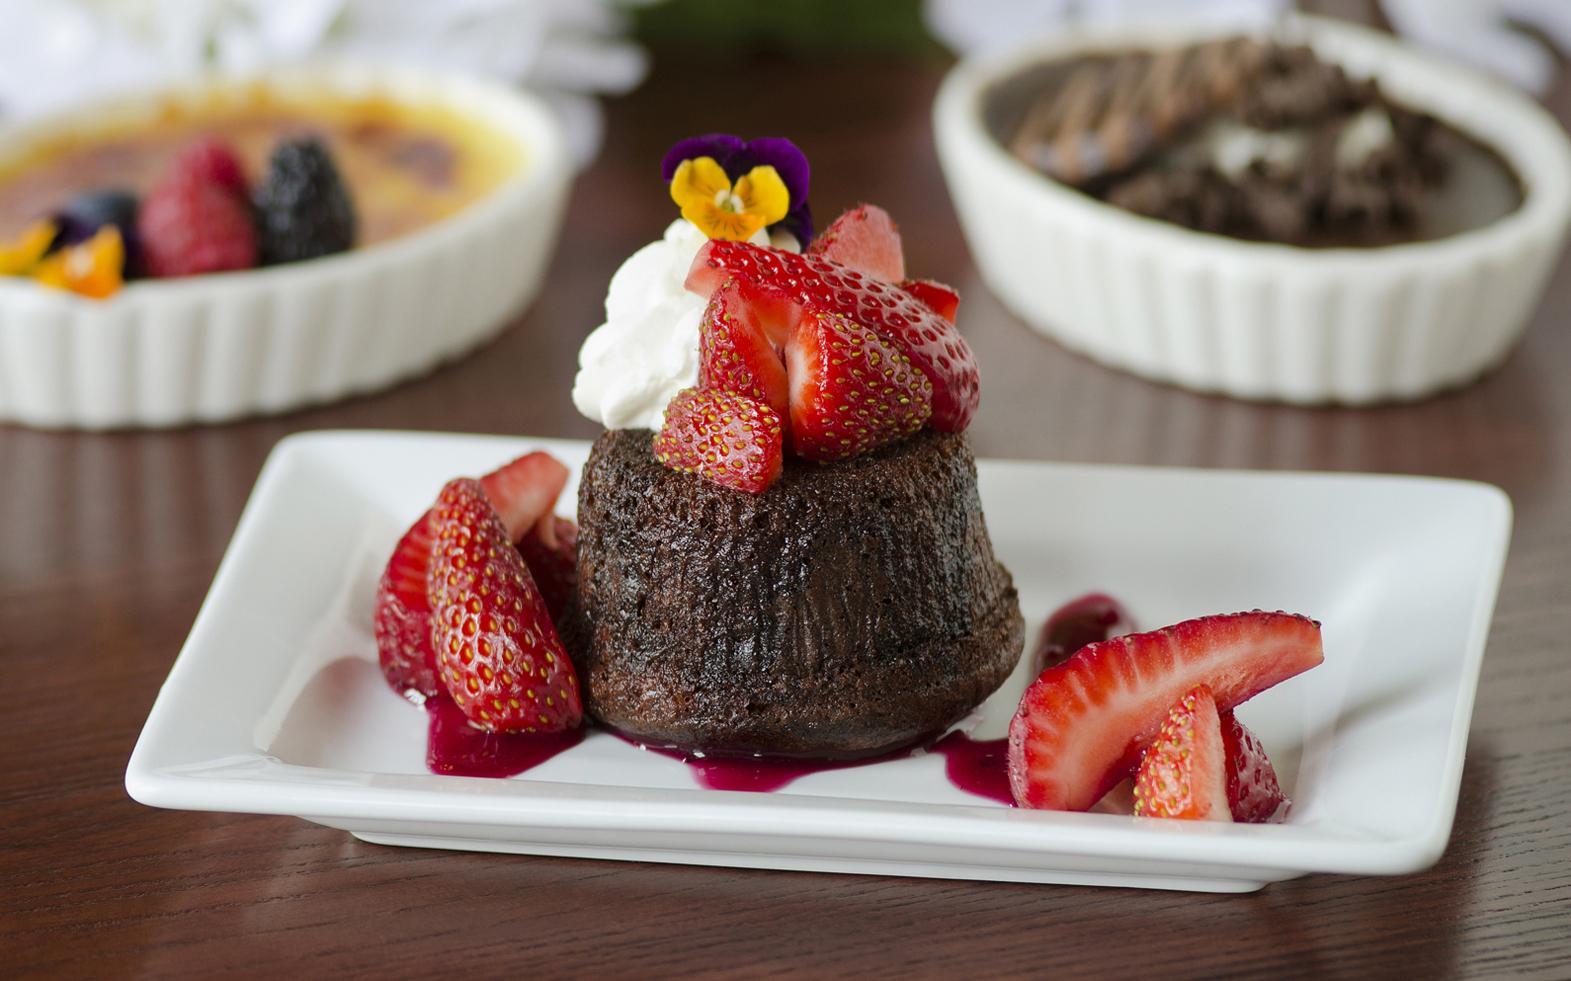 Detroit food photographer Jeff White photographs a dessert for Morels restaurant.